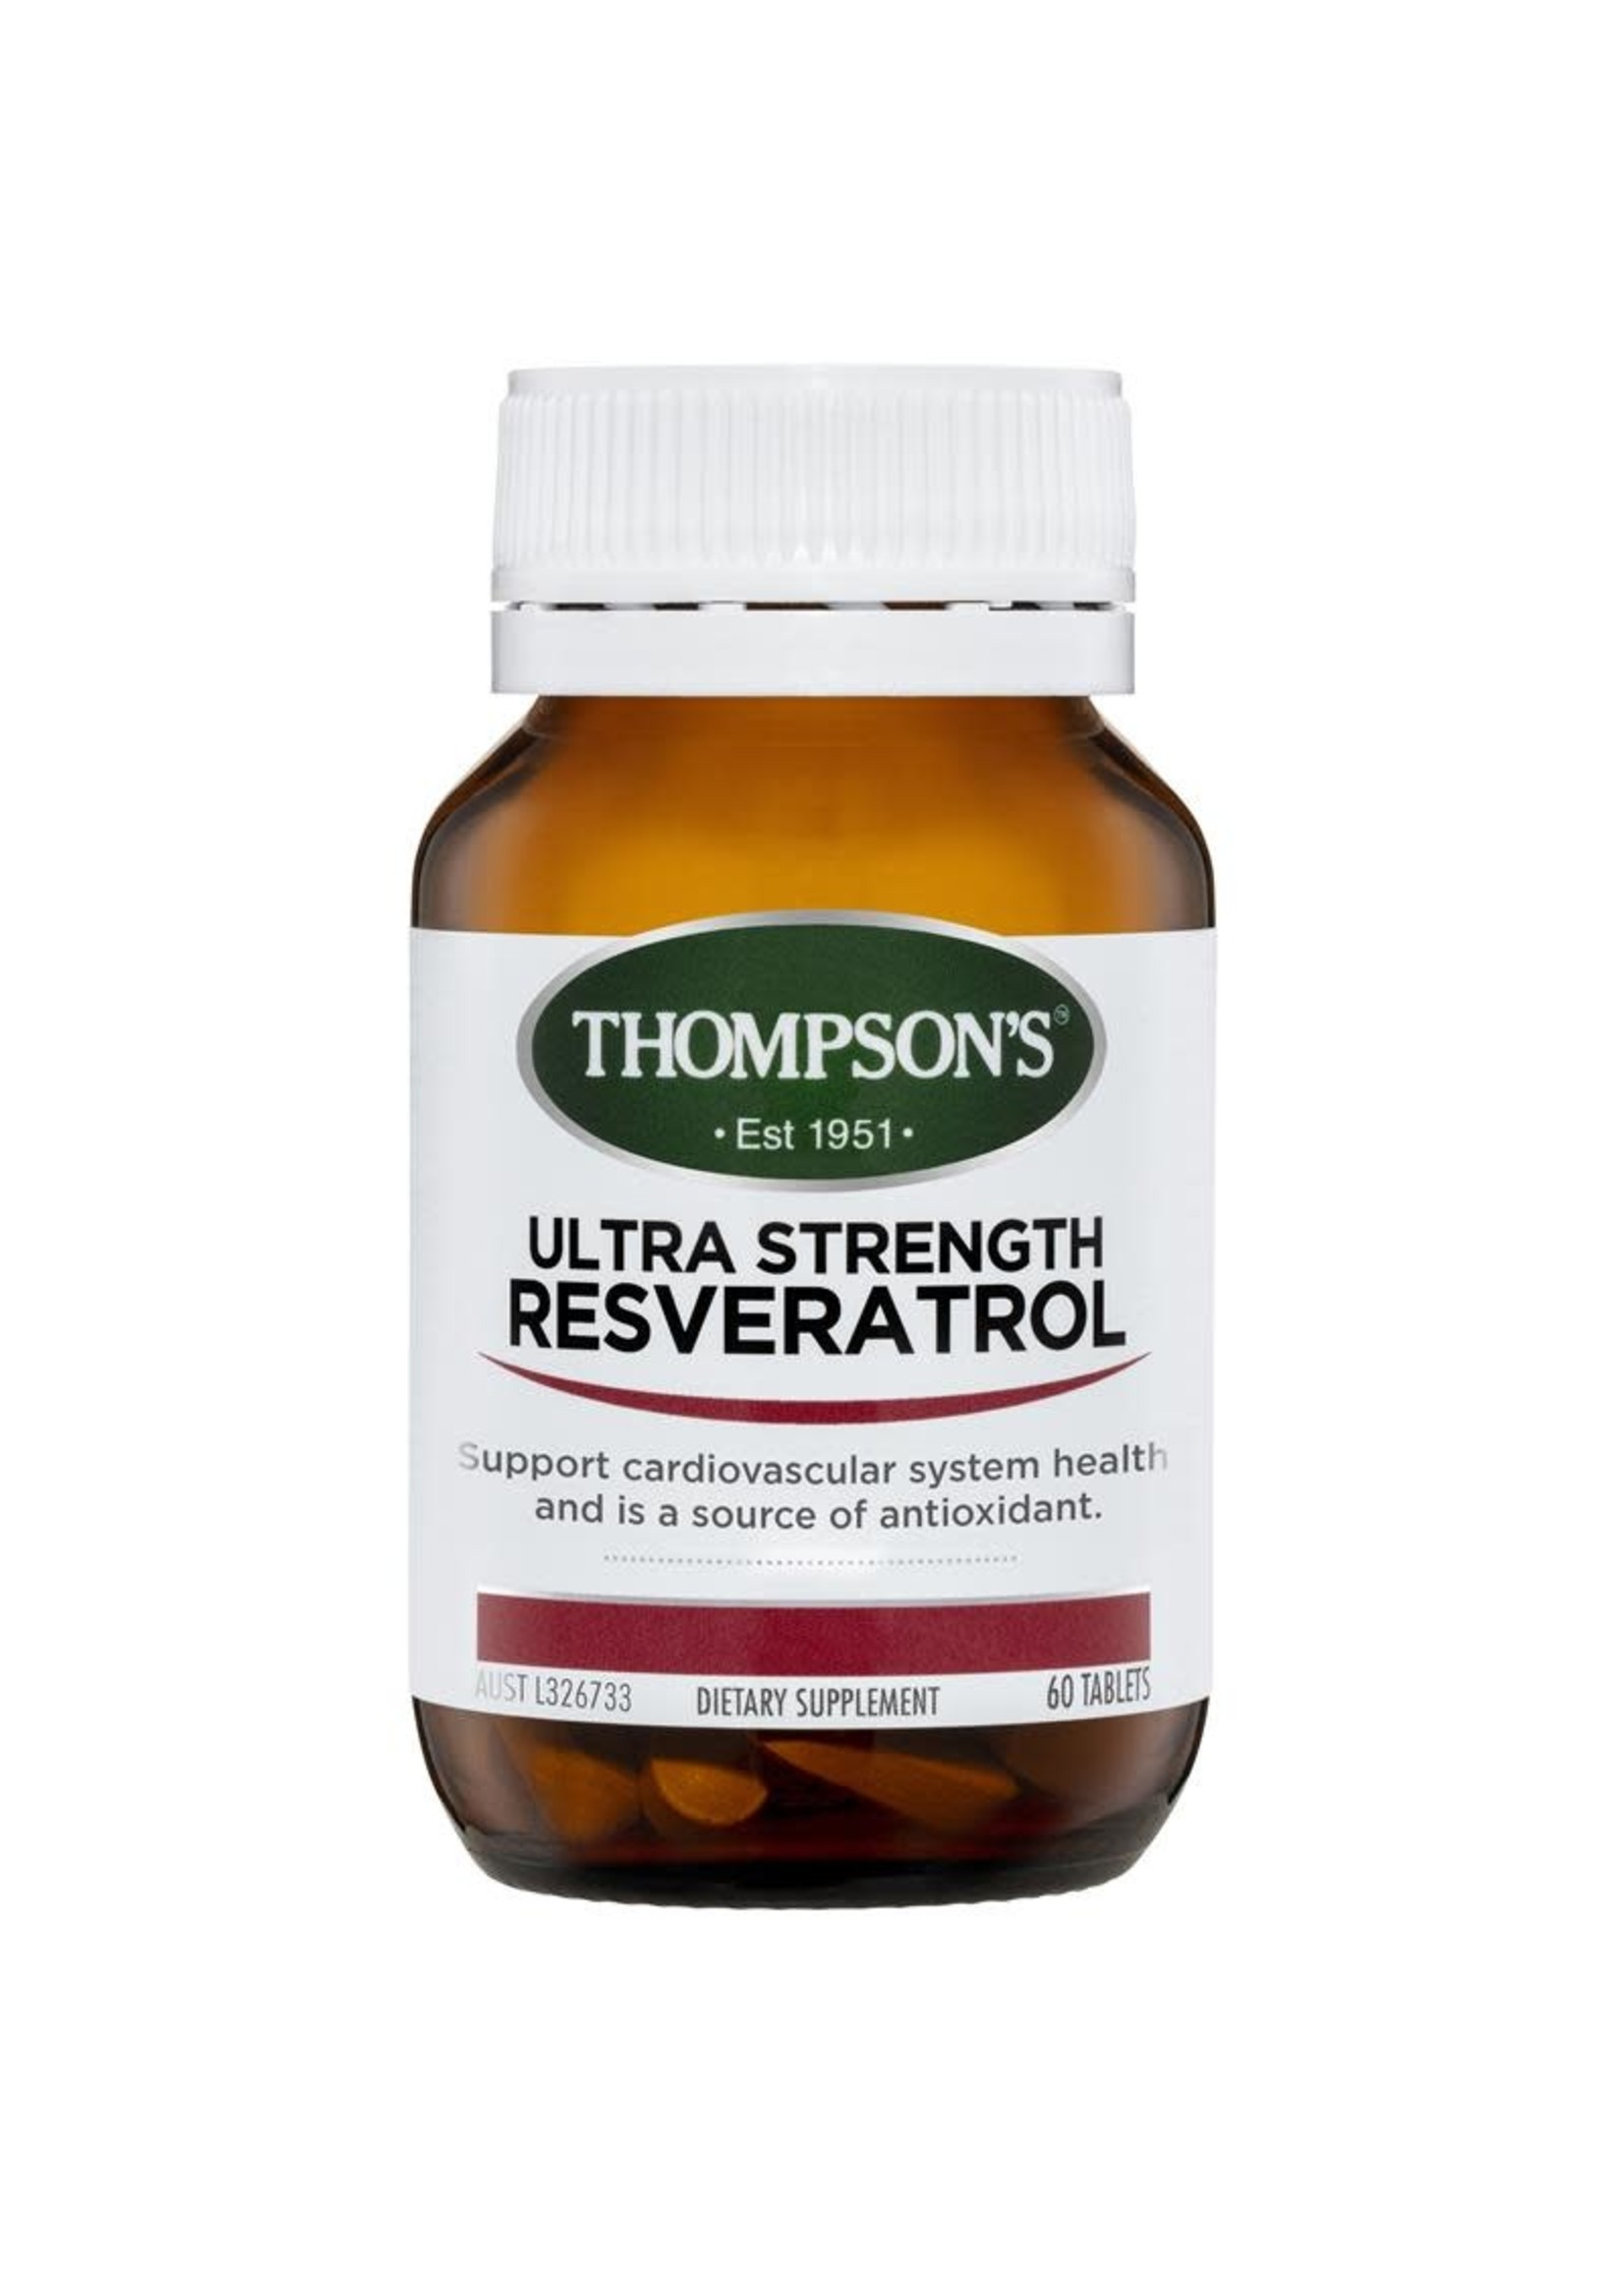 Thompsons Thompson Ultra Strength Resveratrol 60 tabs